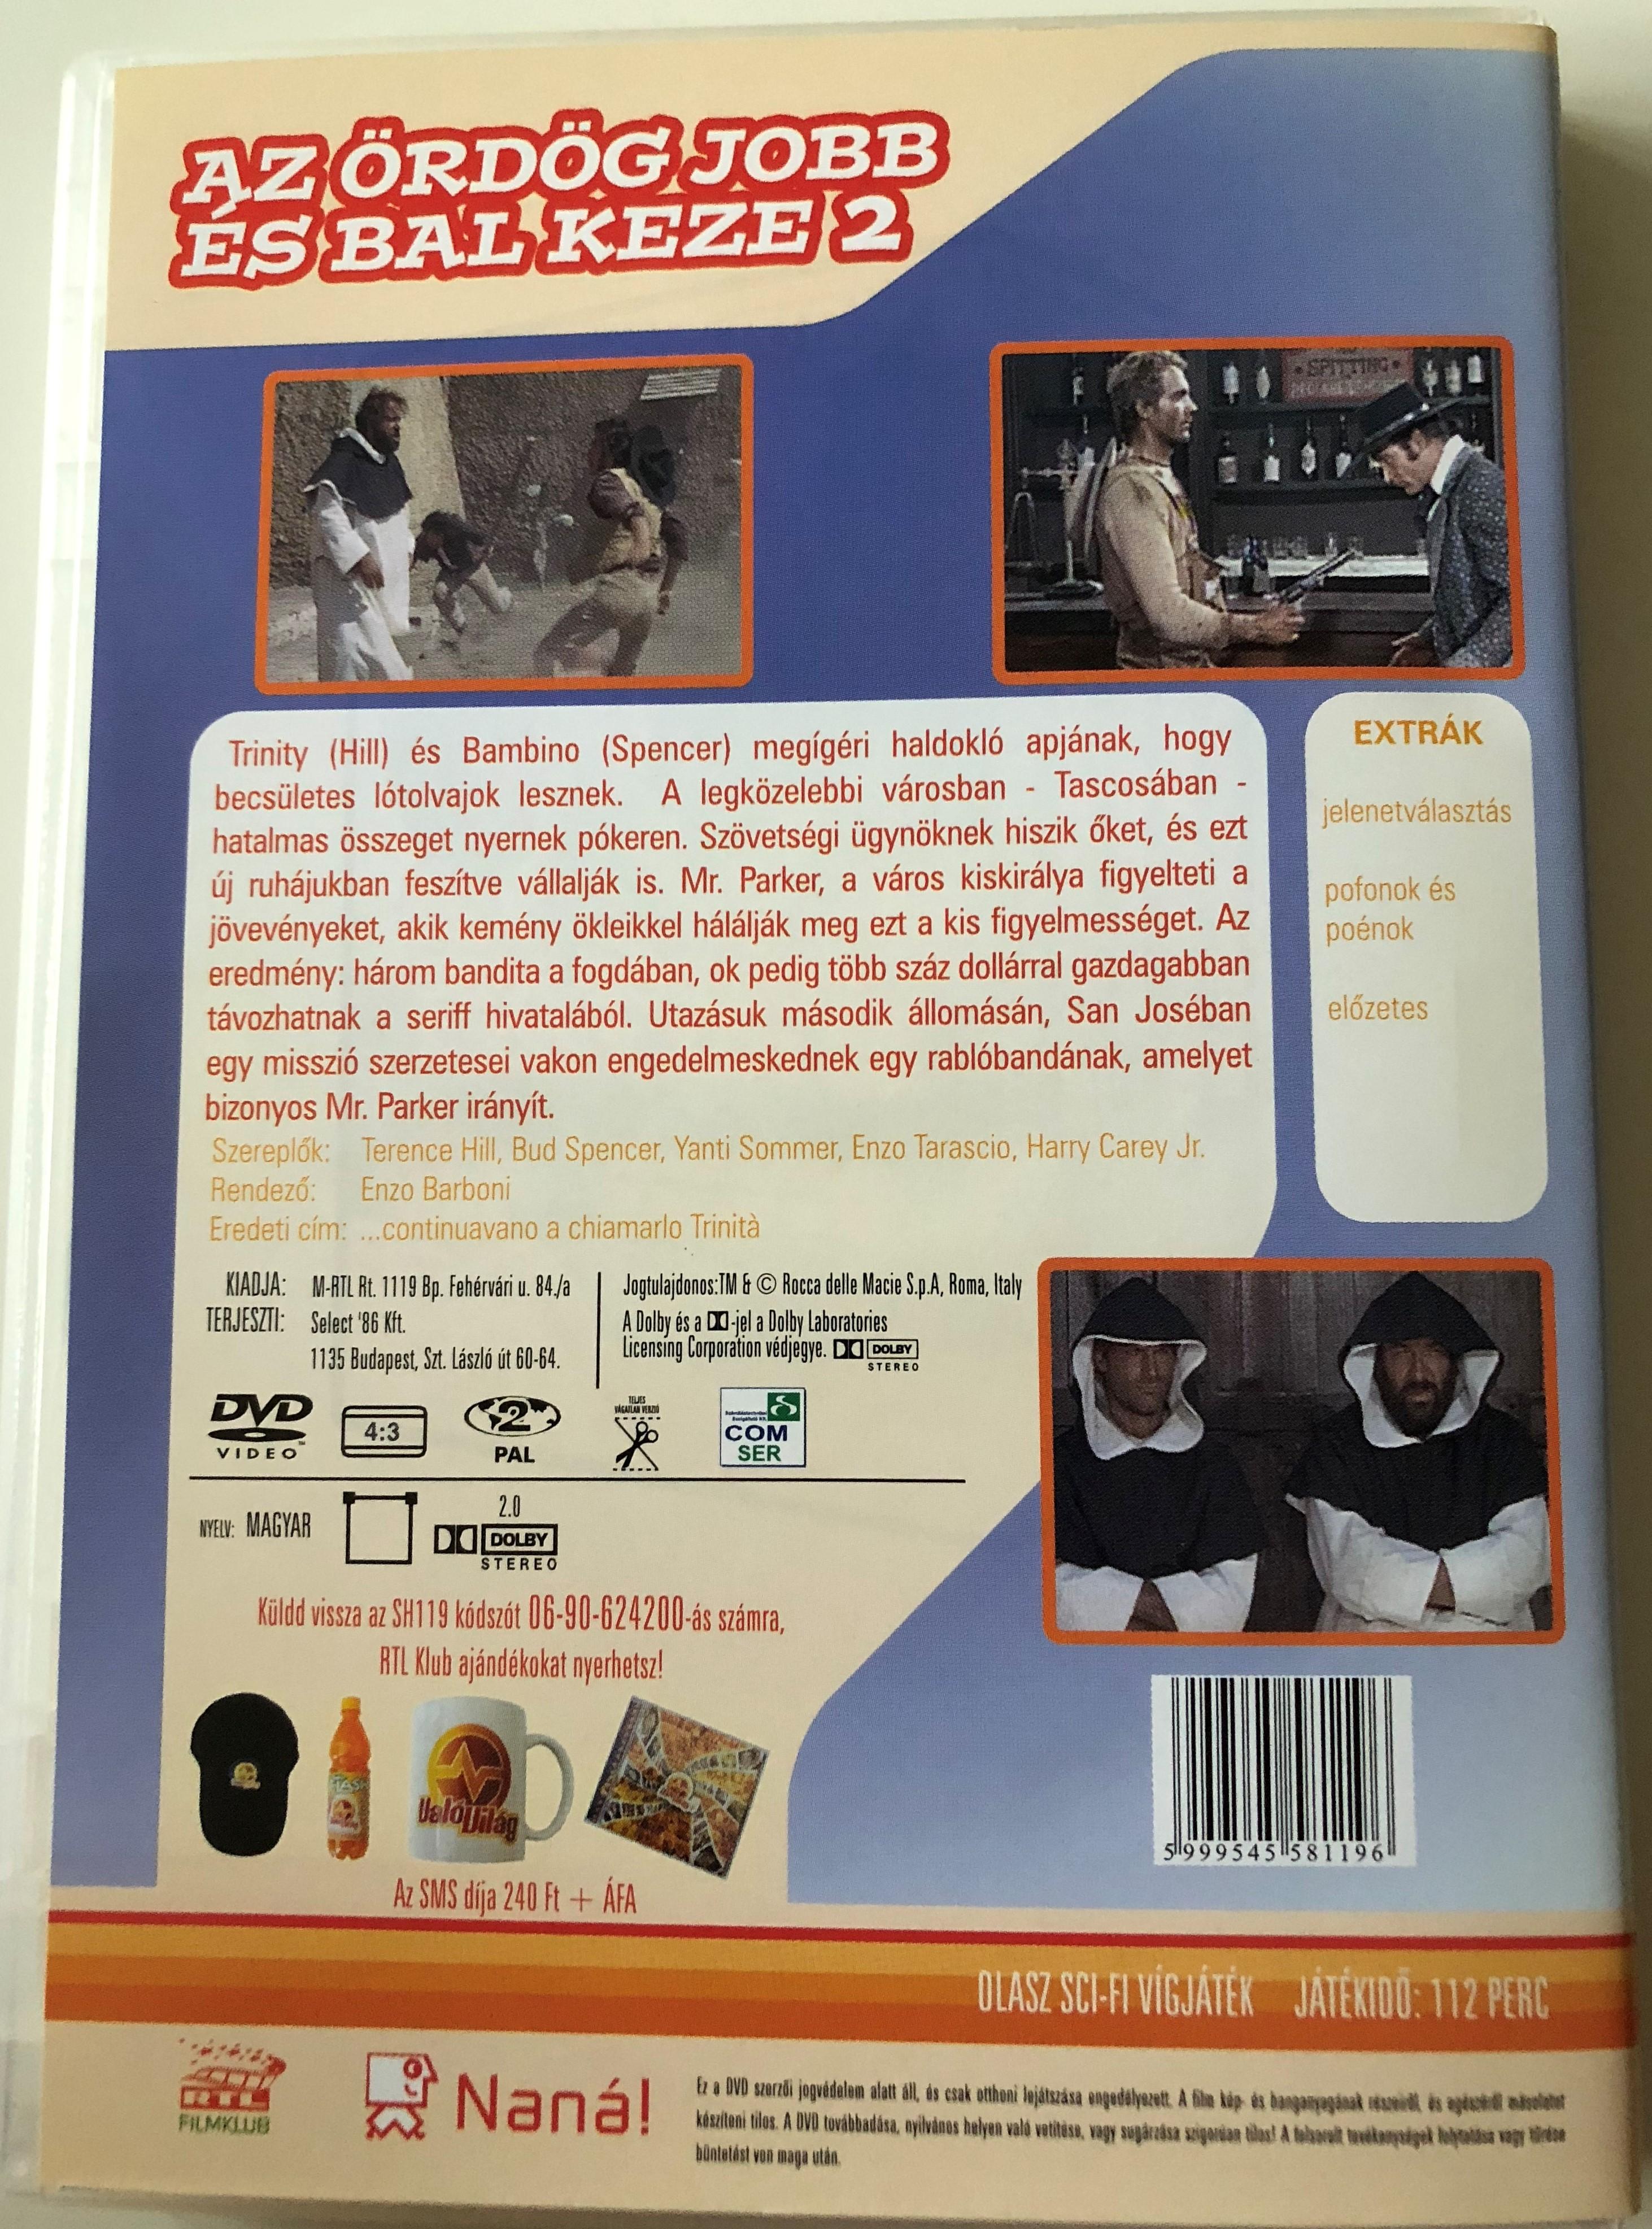 az-rd-g-jobb-s-bal-keze-2.-dvd-1971-2-.jpg